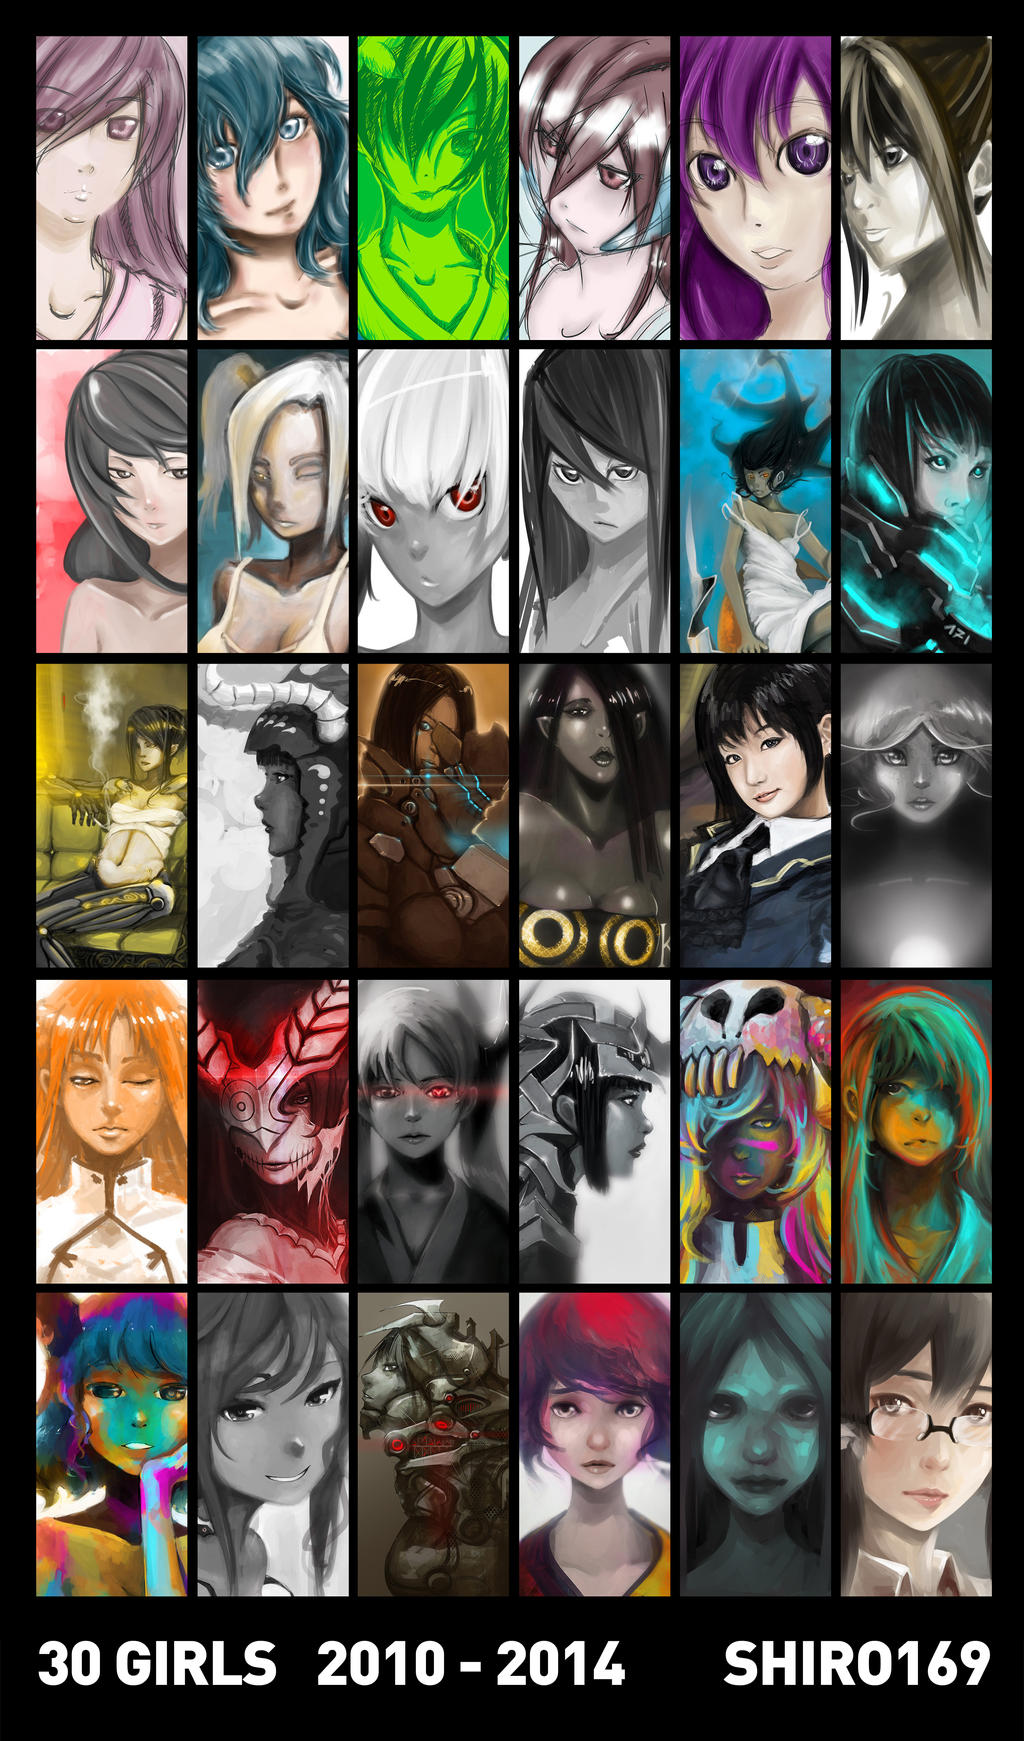 30 GIRLS retrospective 2010-2014 by Shiro169